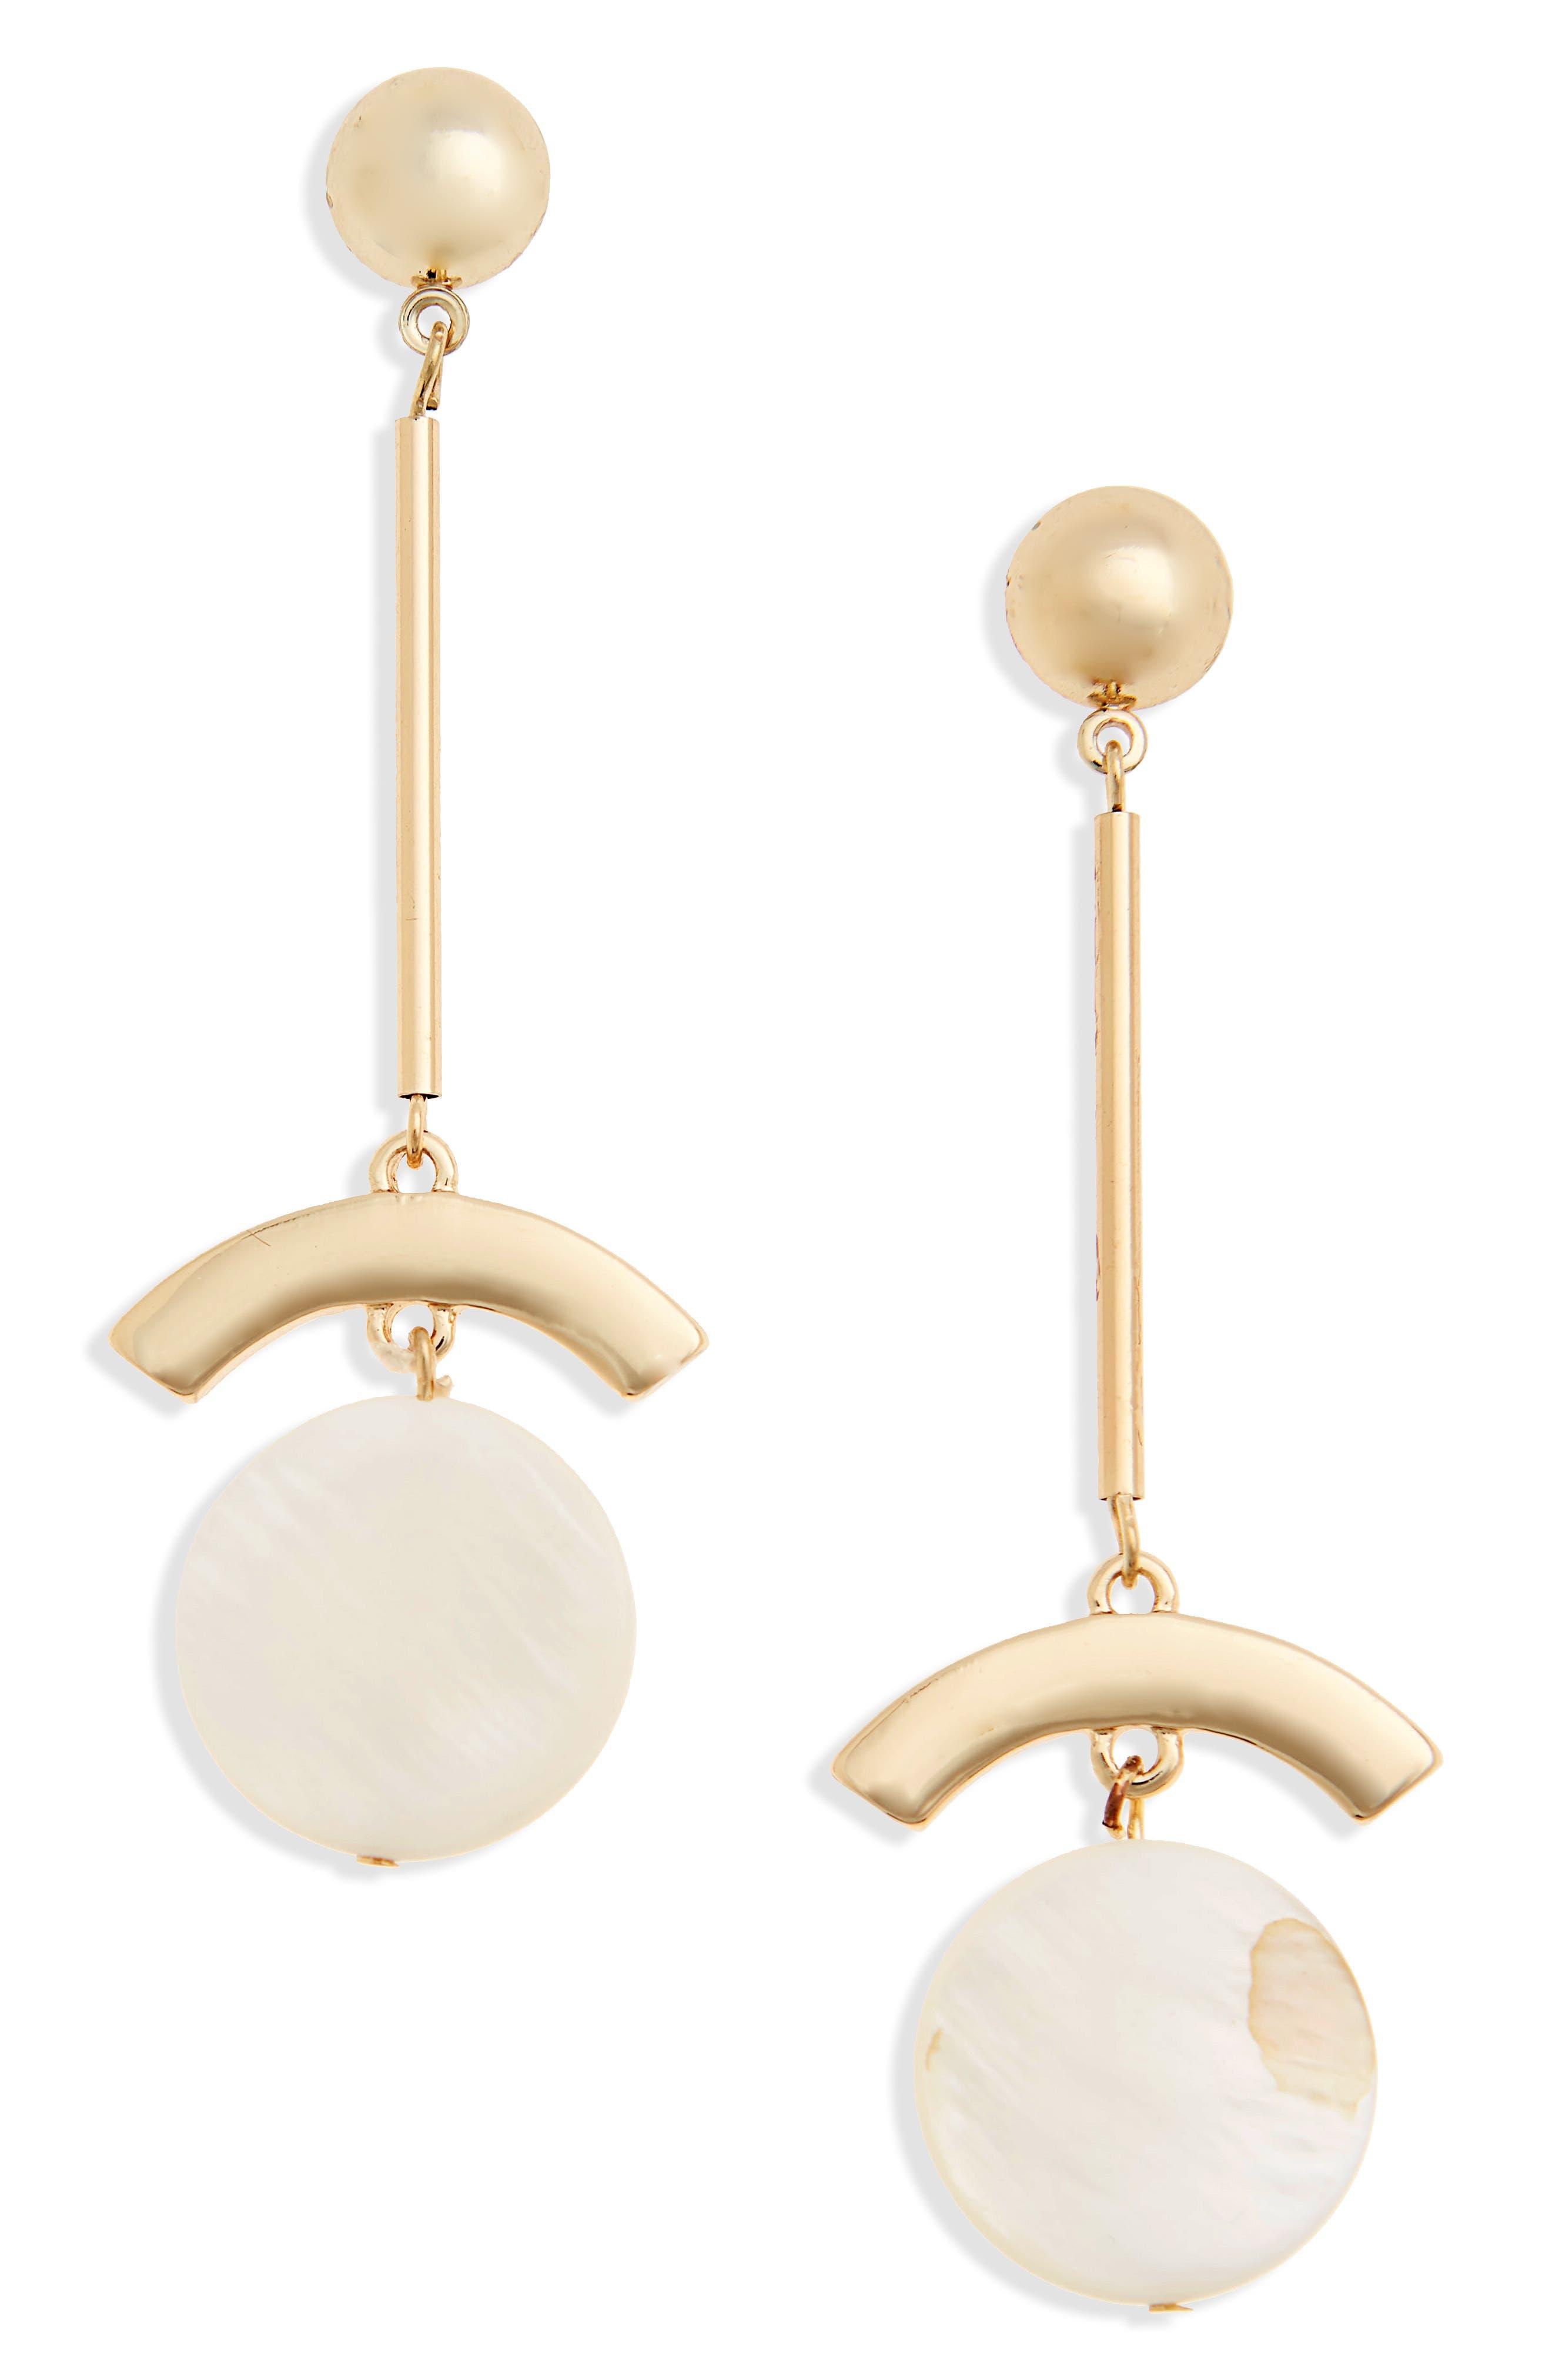 Mother of Pearl Drop Earrings,                             Main thumbnail 1, color,                             710